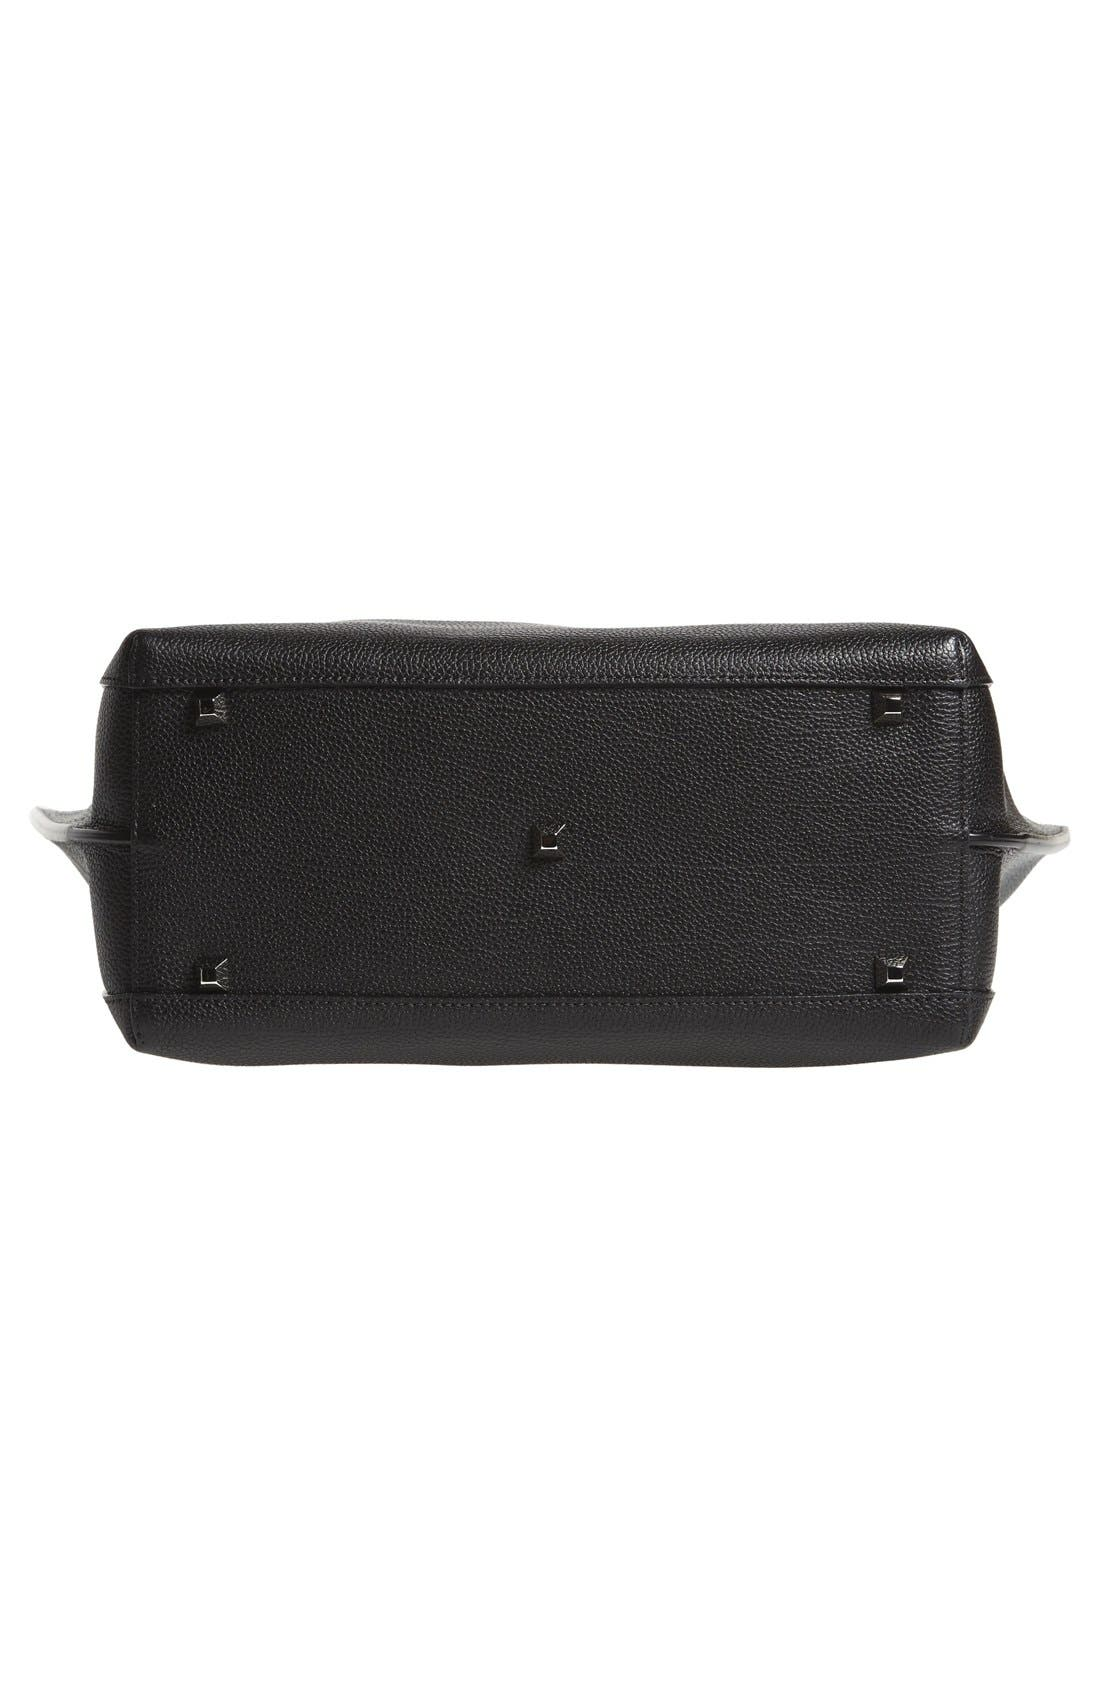 'Medium Sophie' Leather Shopper,                             Alternate thumbnail 6, color,                             Black